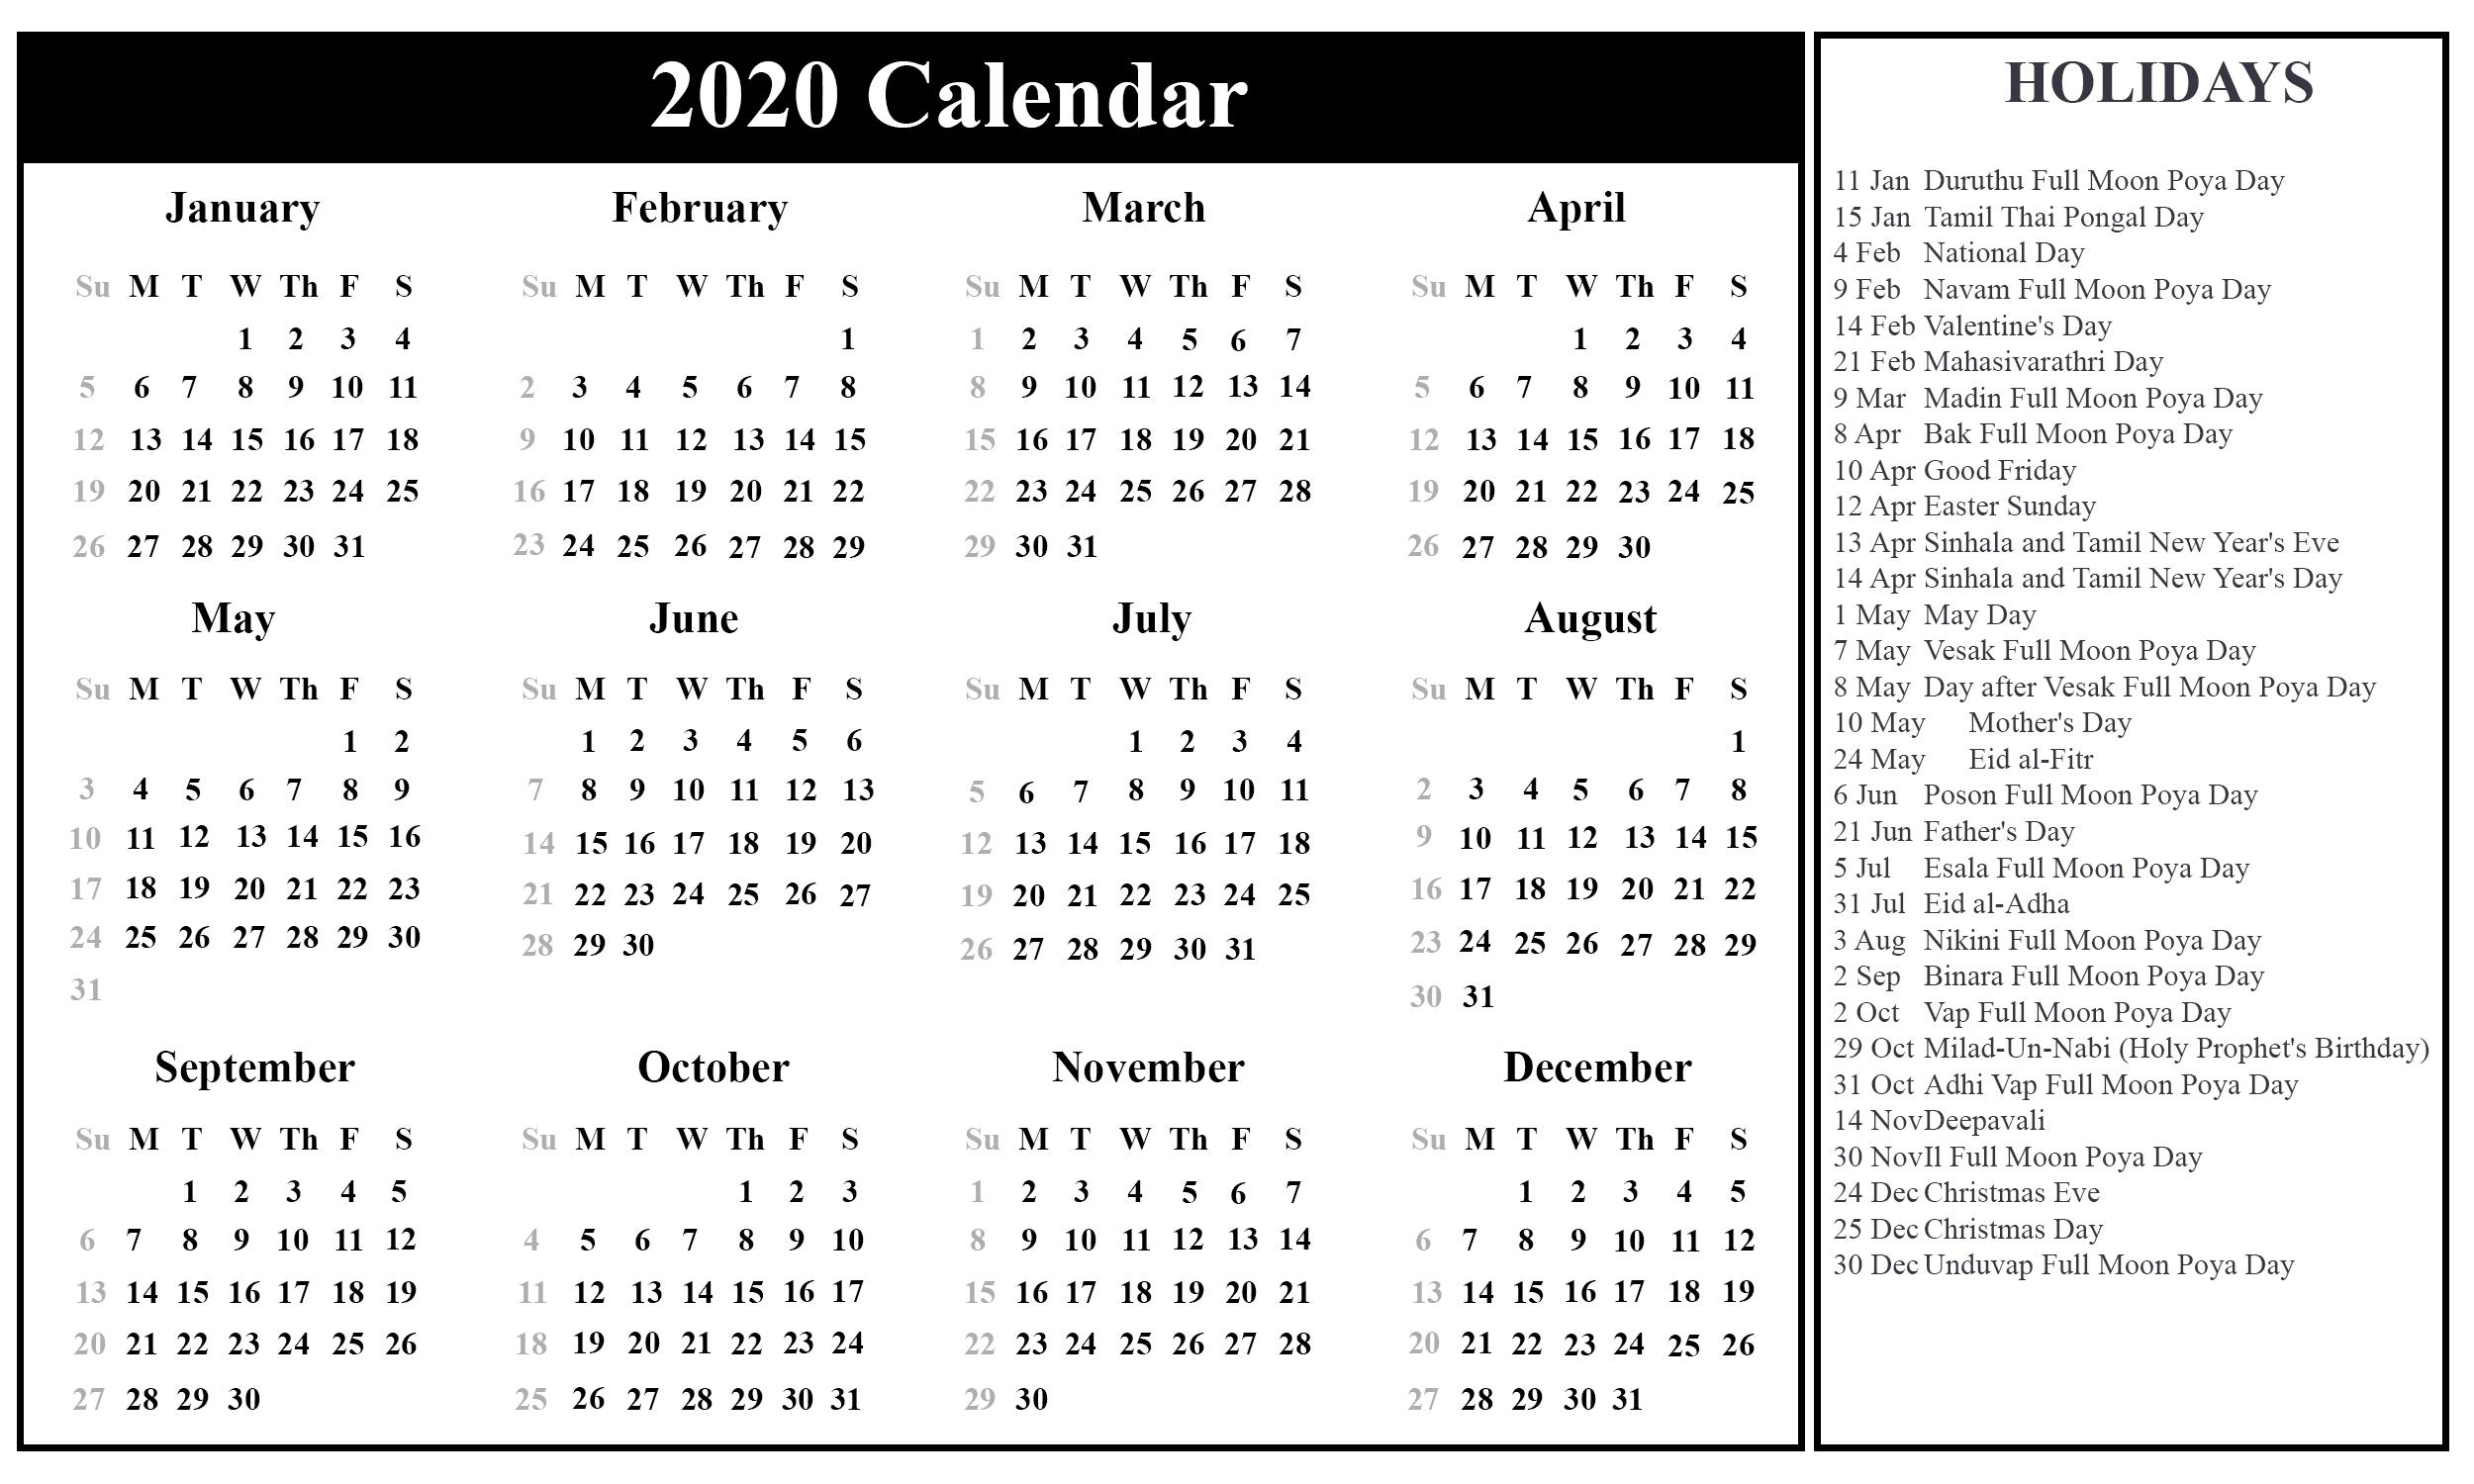 😄free Sri Lanka 2020 Calendar With Holidays In Pdf Word 2020 Calendar Holidays Sri Lanka